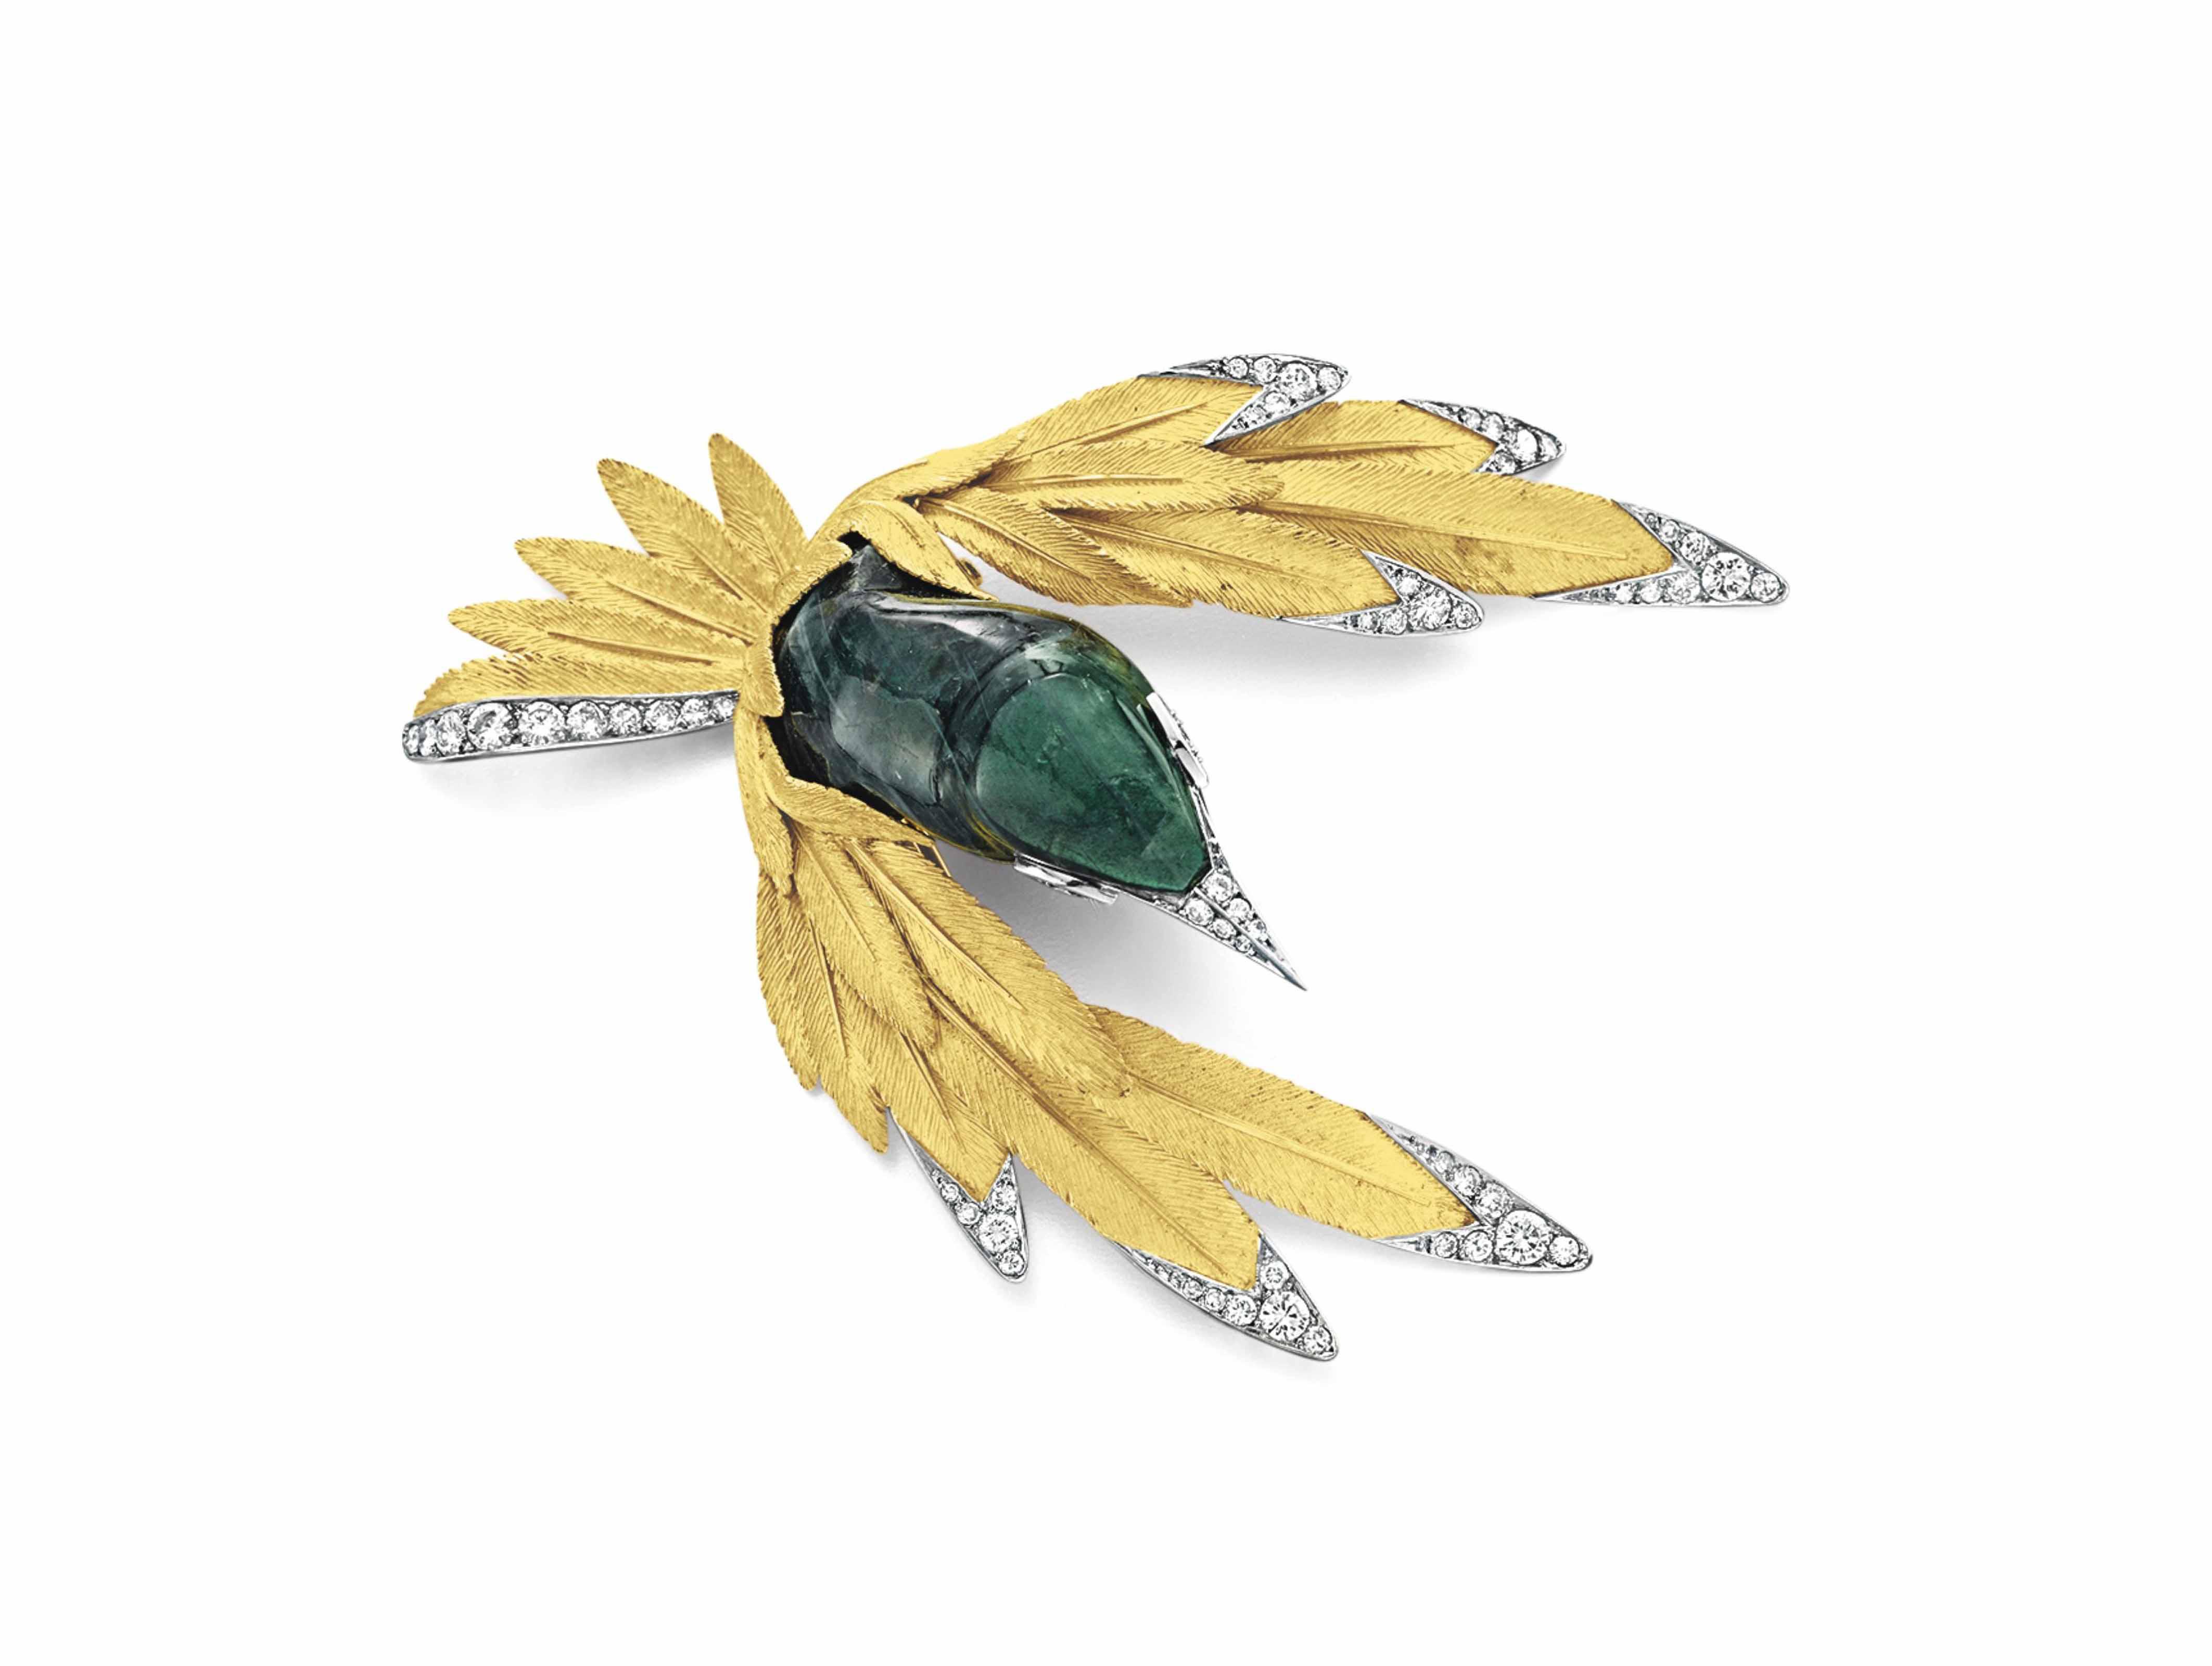 A LABRADORITE, DIAMOND AND GOLD BIRD BROOCH, BY STERLÉ